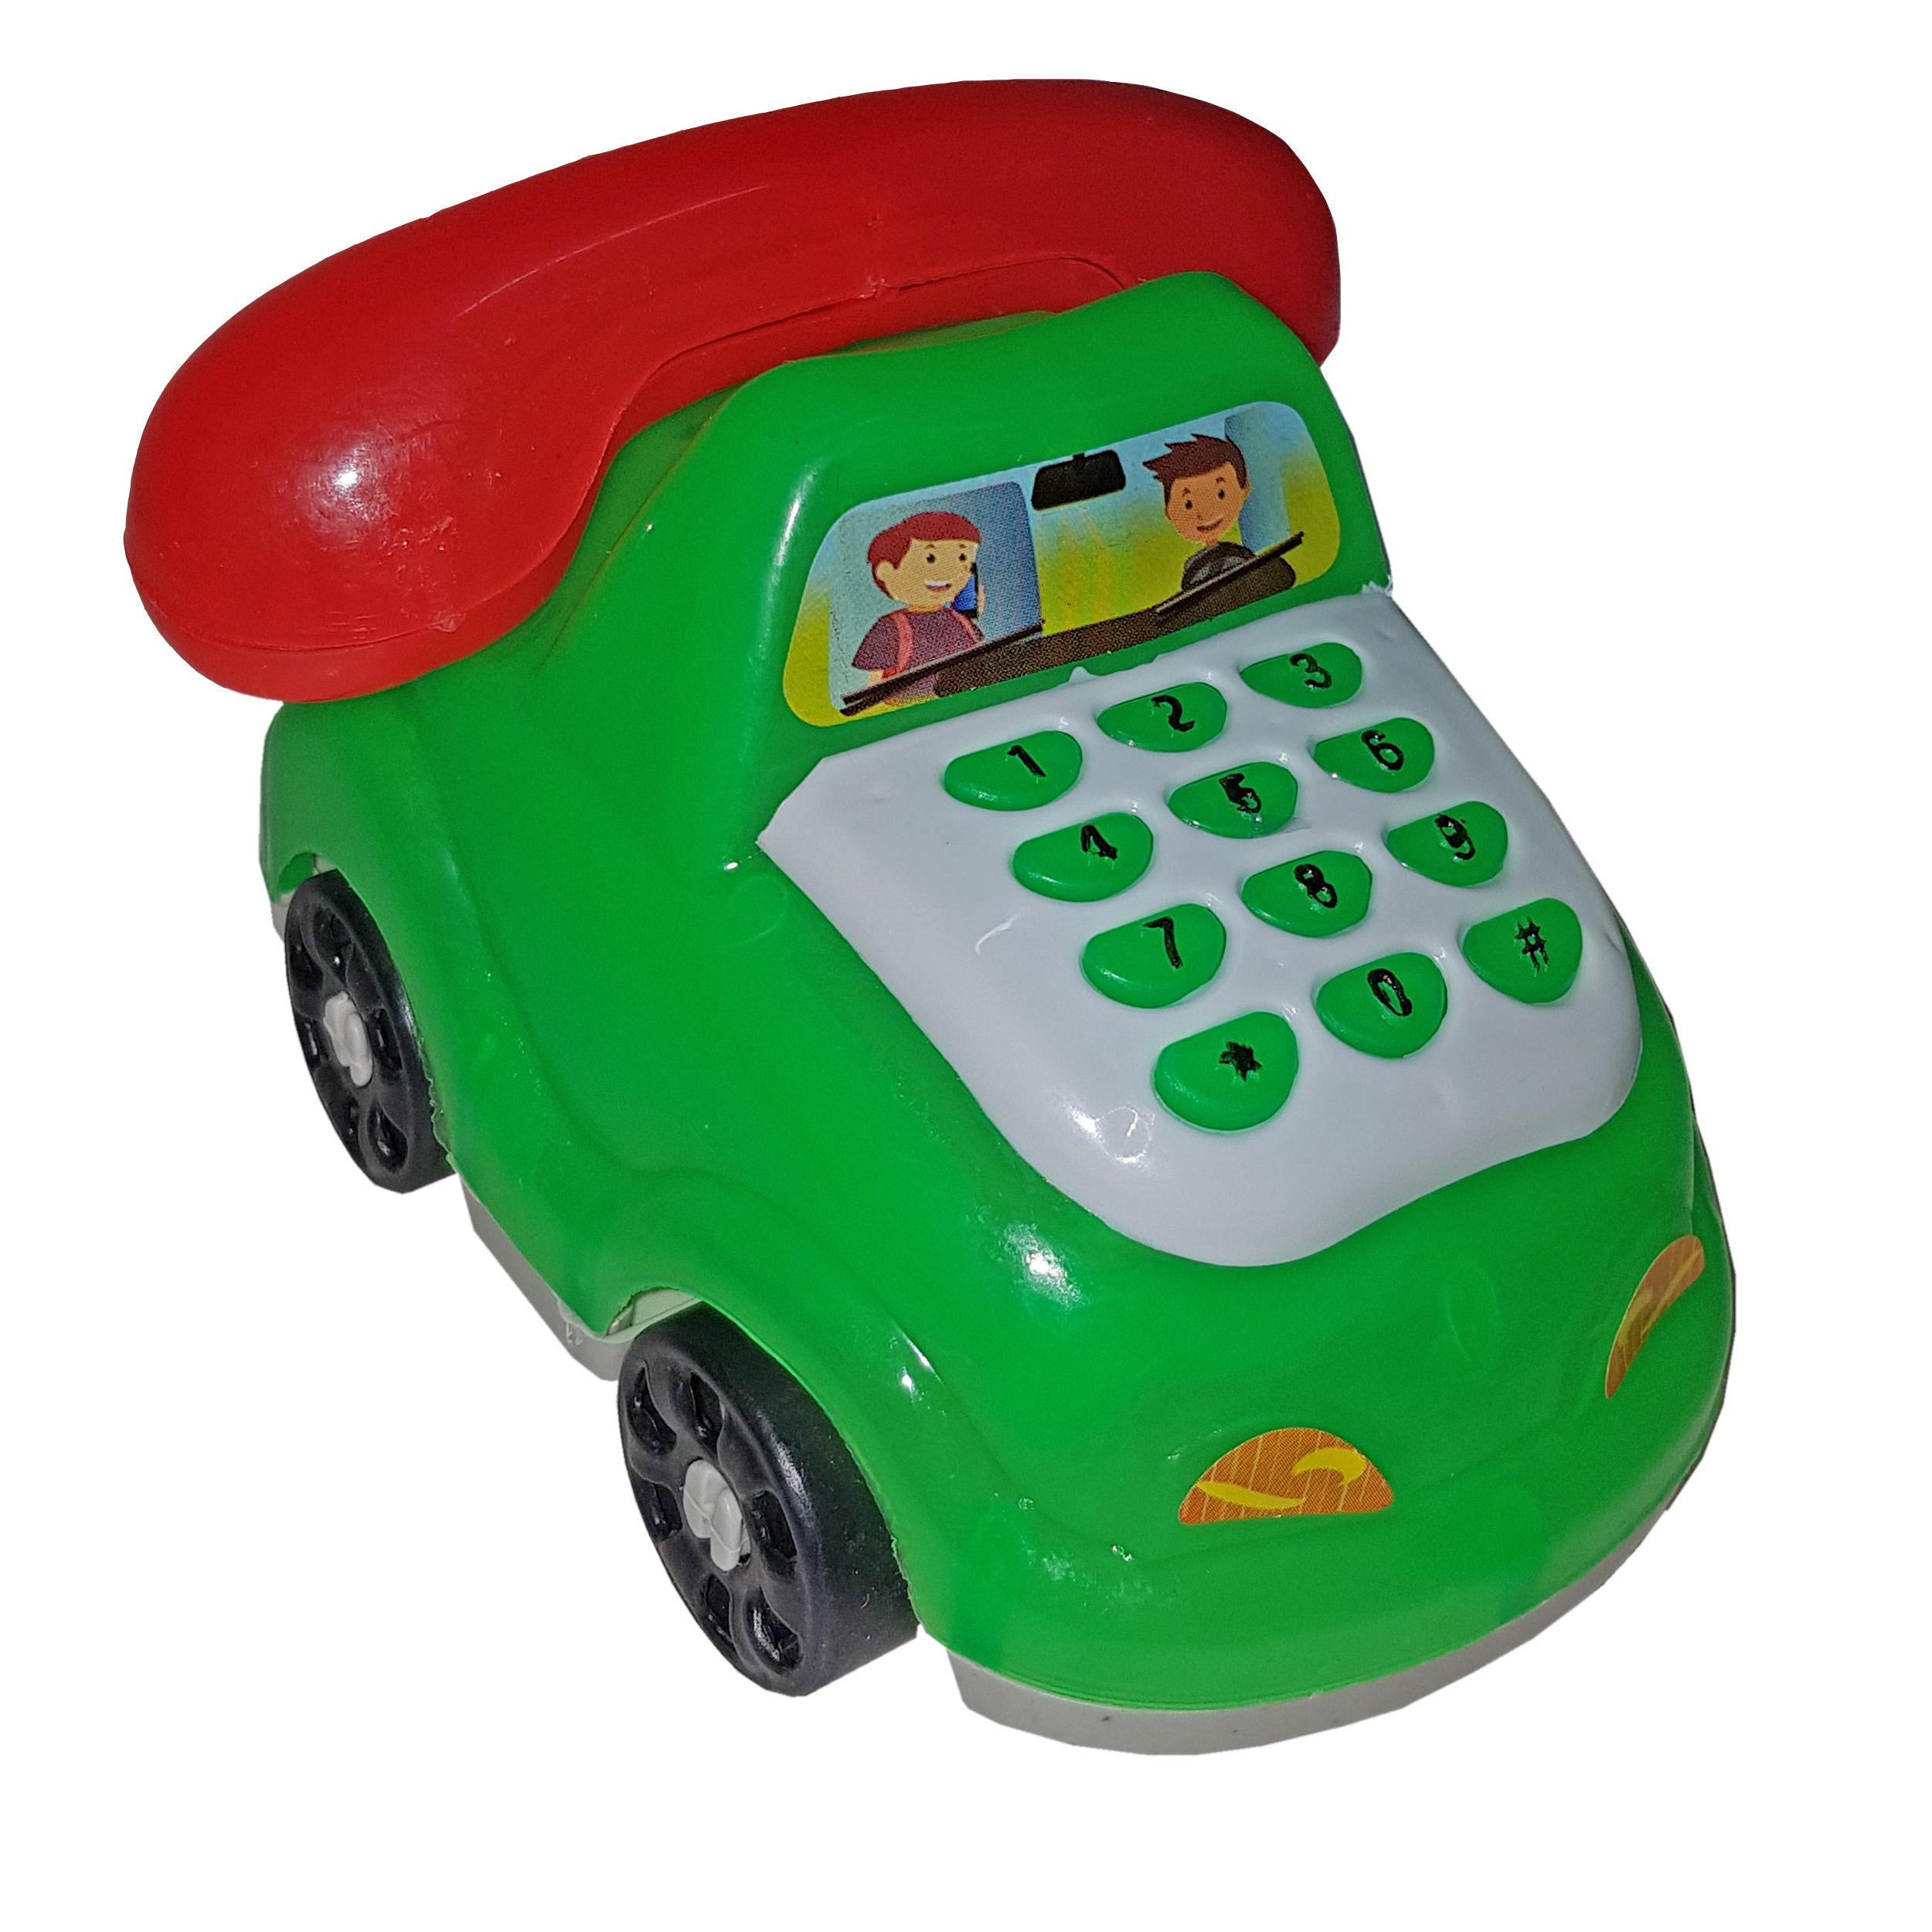 اسباب بازی لوازم خانه طرح ماشین مدل تلفن